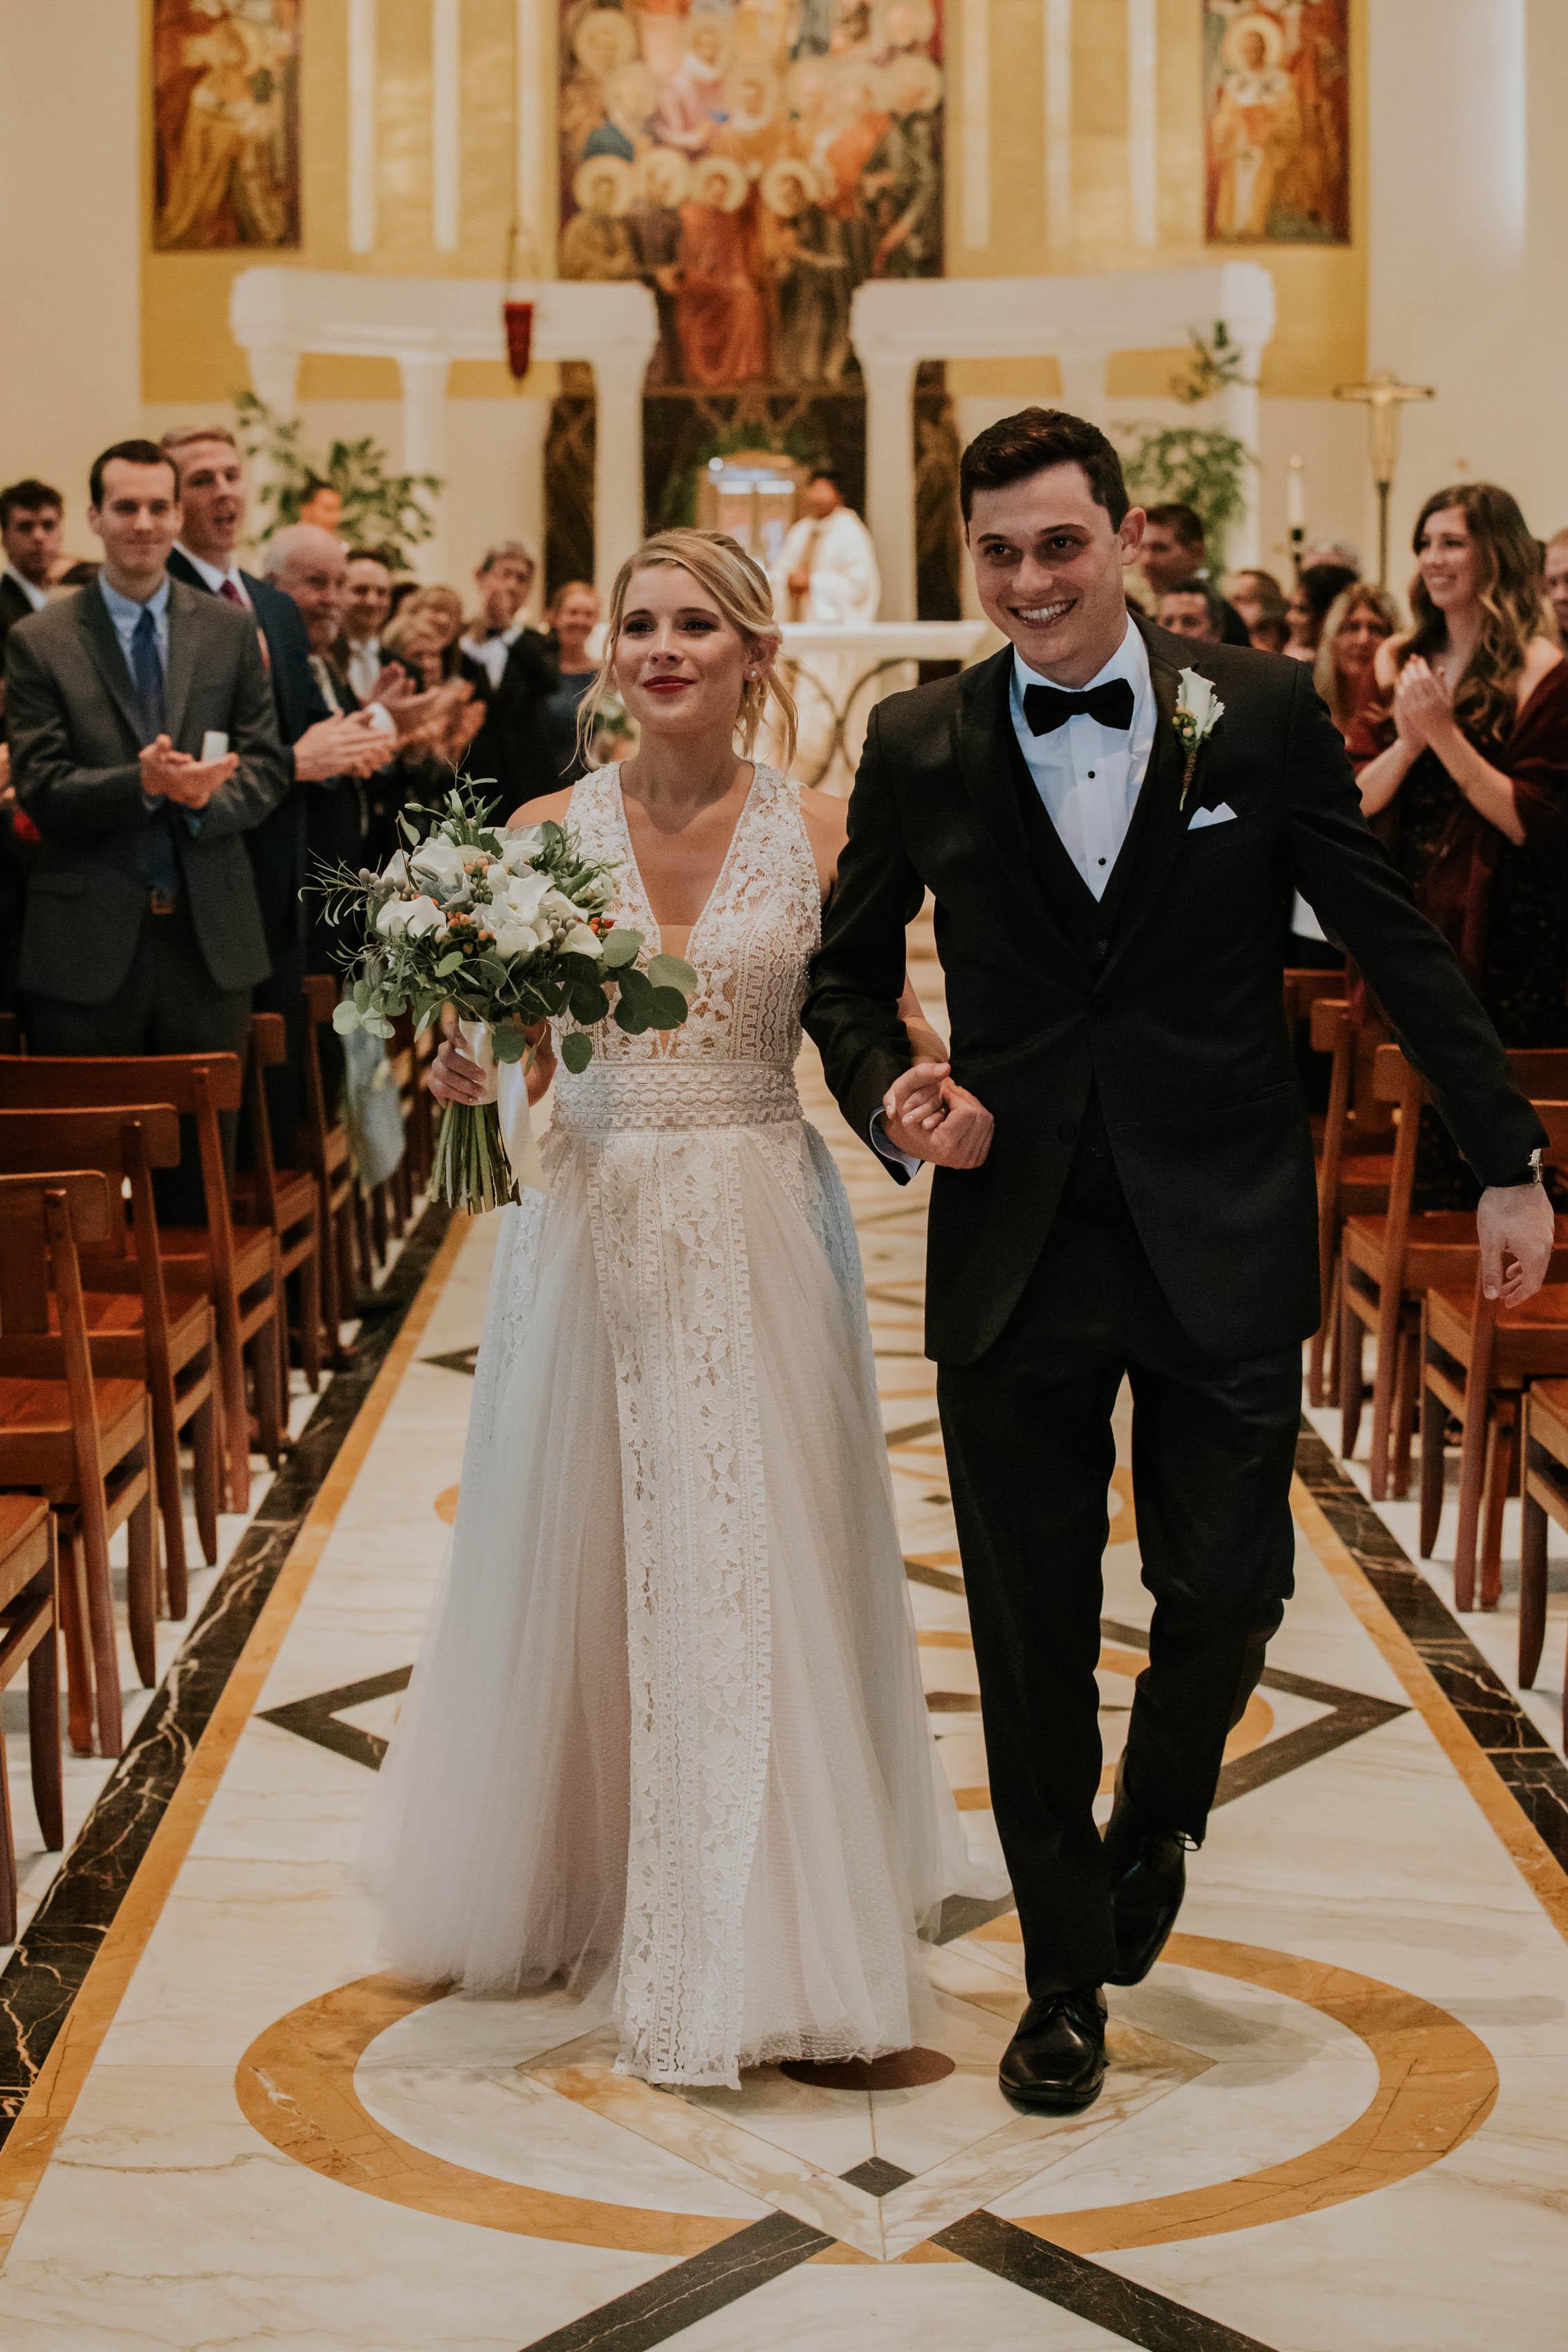 Jenero Wedding 100618-296.jpg